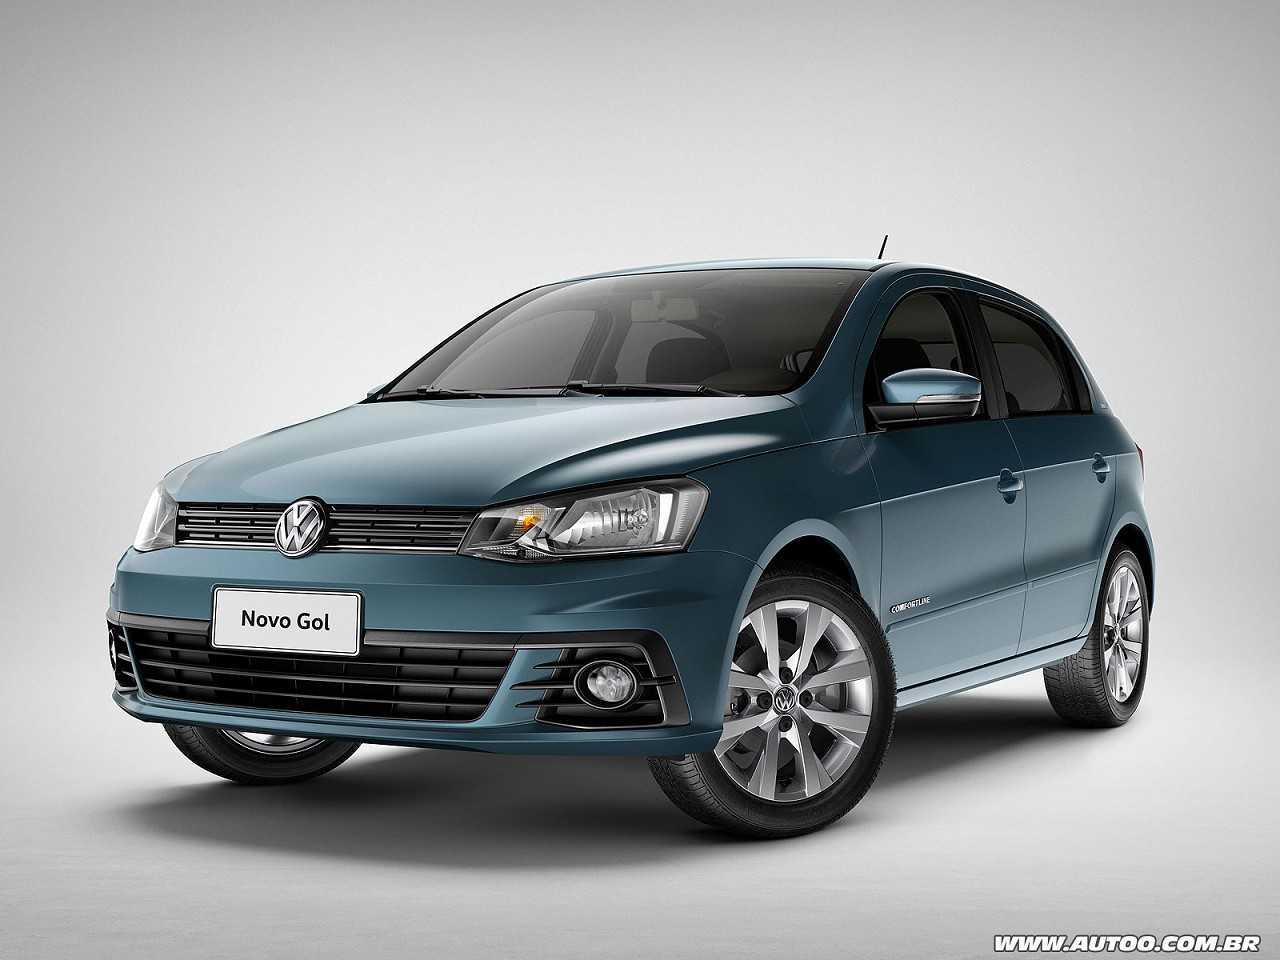 VolkswagenGol 2016 - ângulo frontal